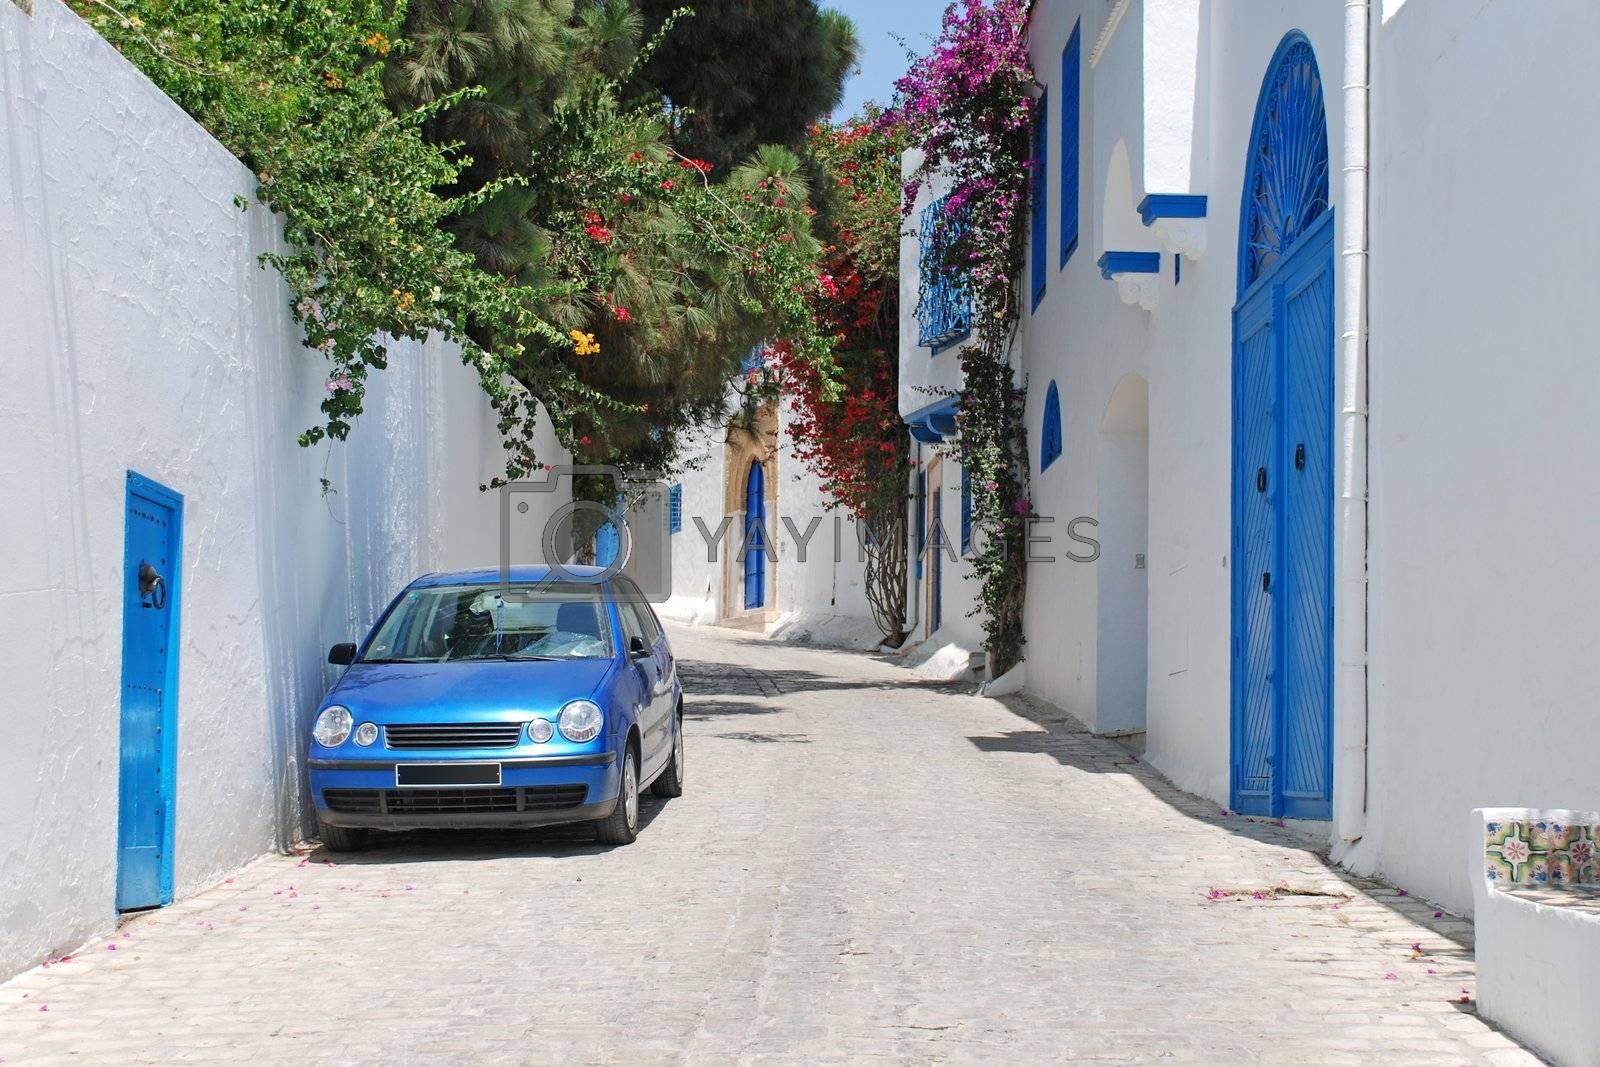 Sidi Bou Said, Tunisia by sergeyakovlev